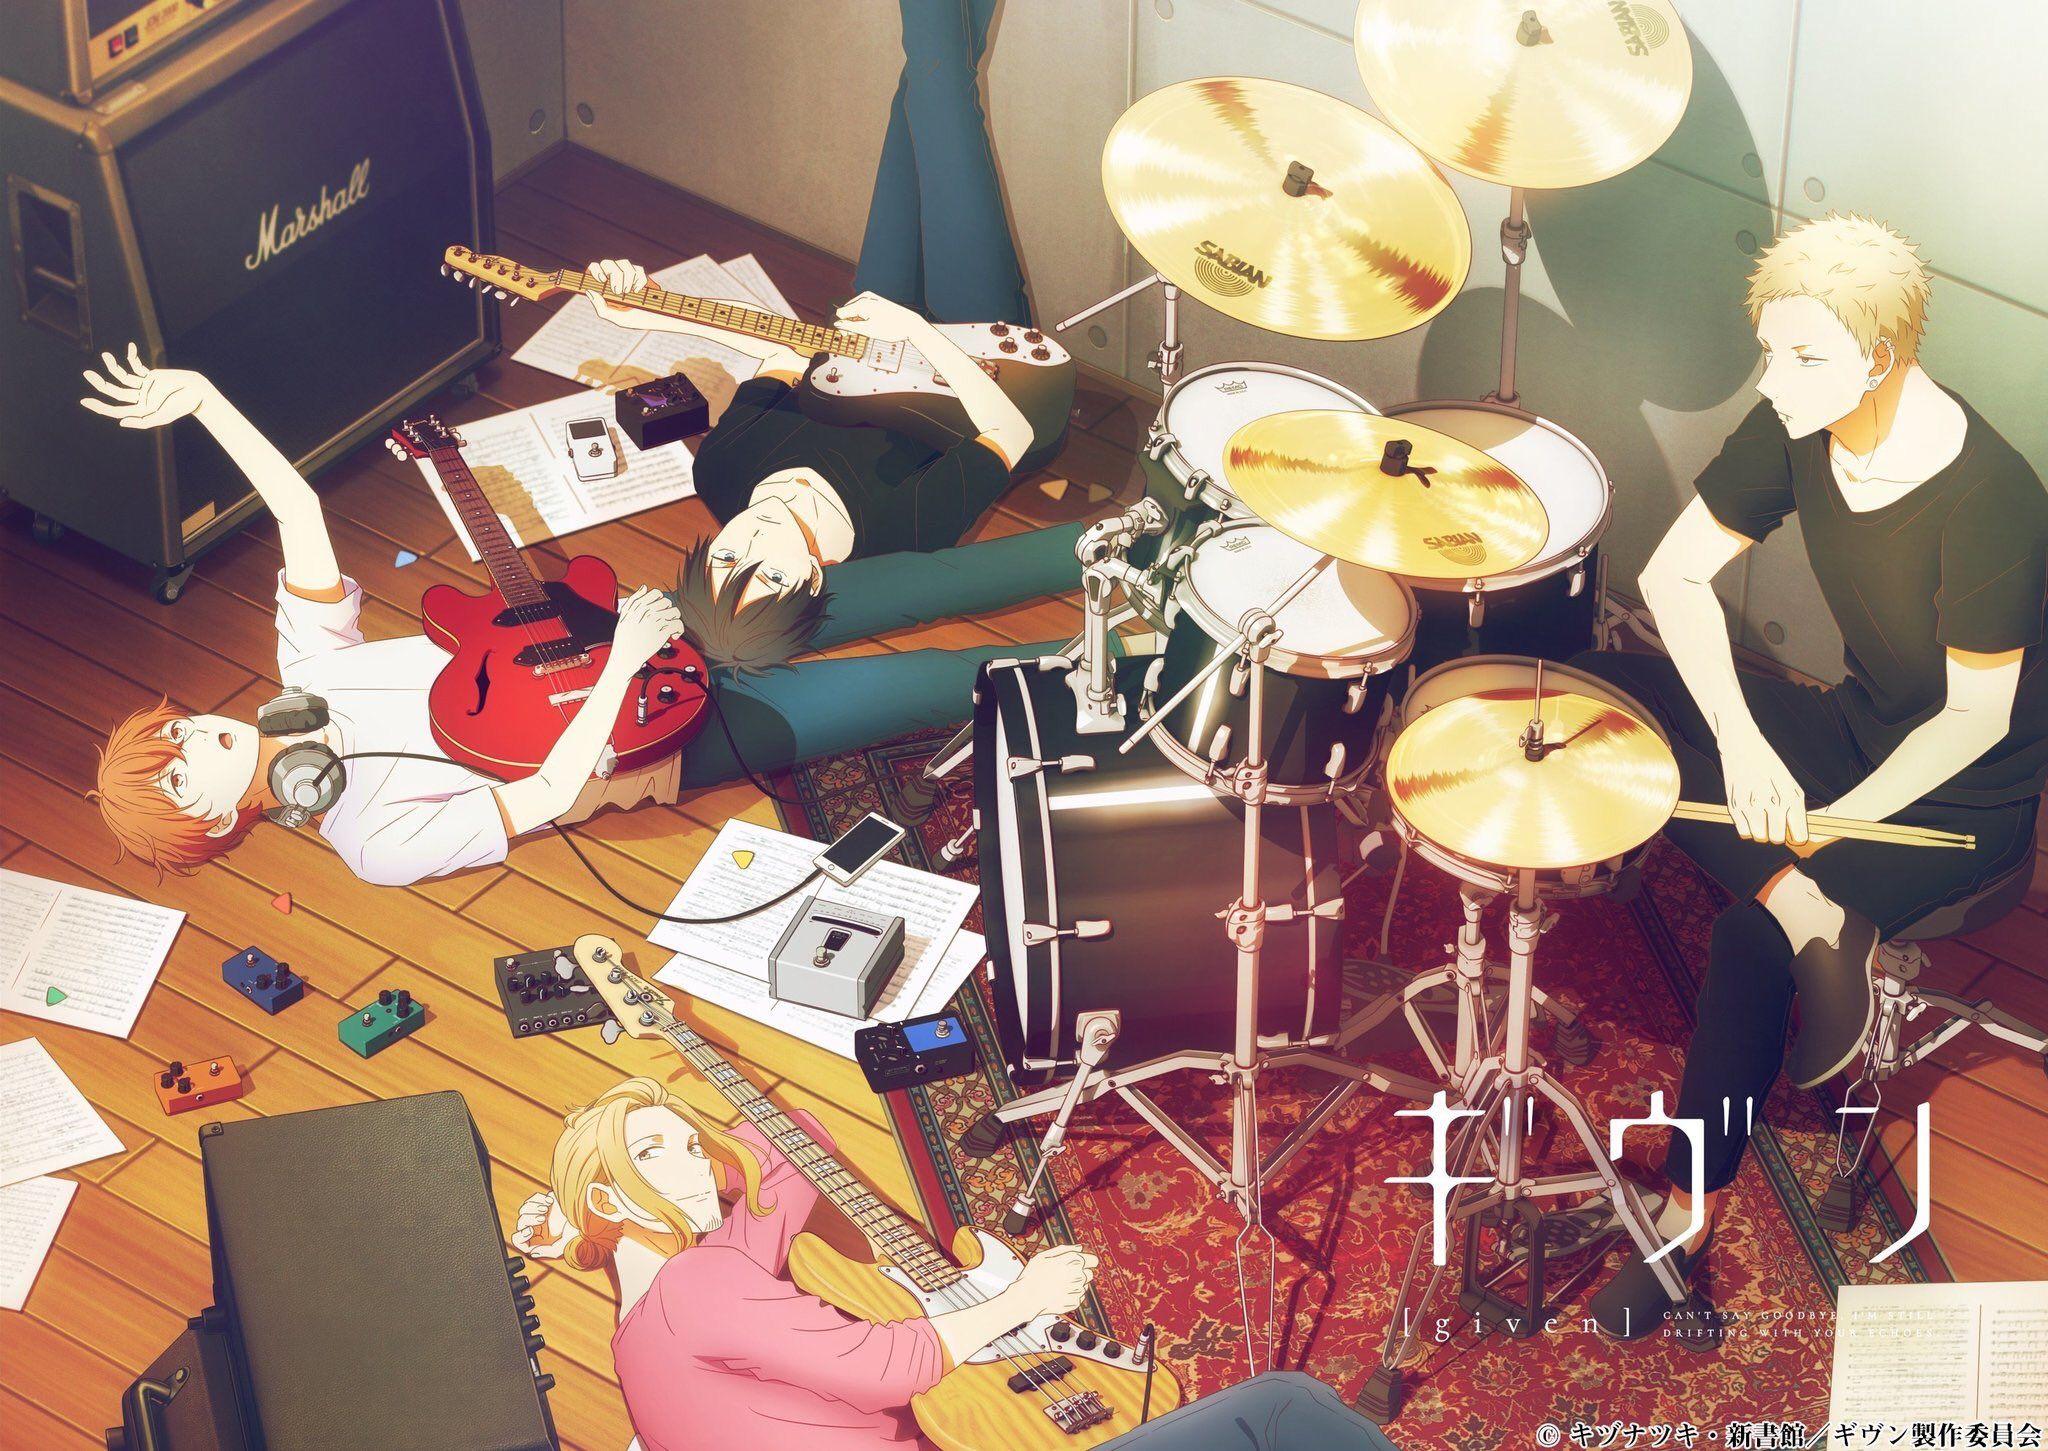 Palomitrón Anime on Anime, Musik und Emotionen